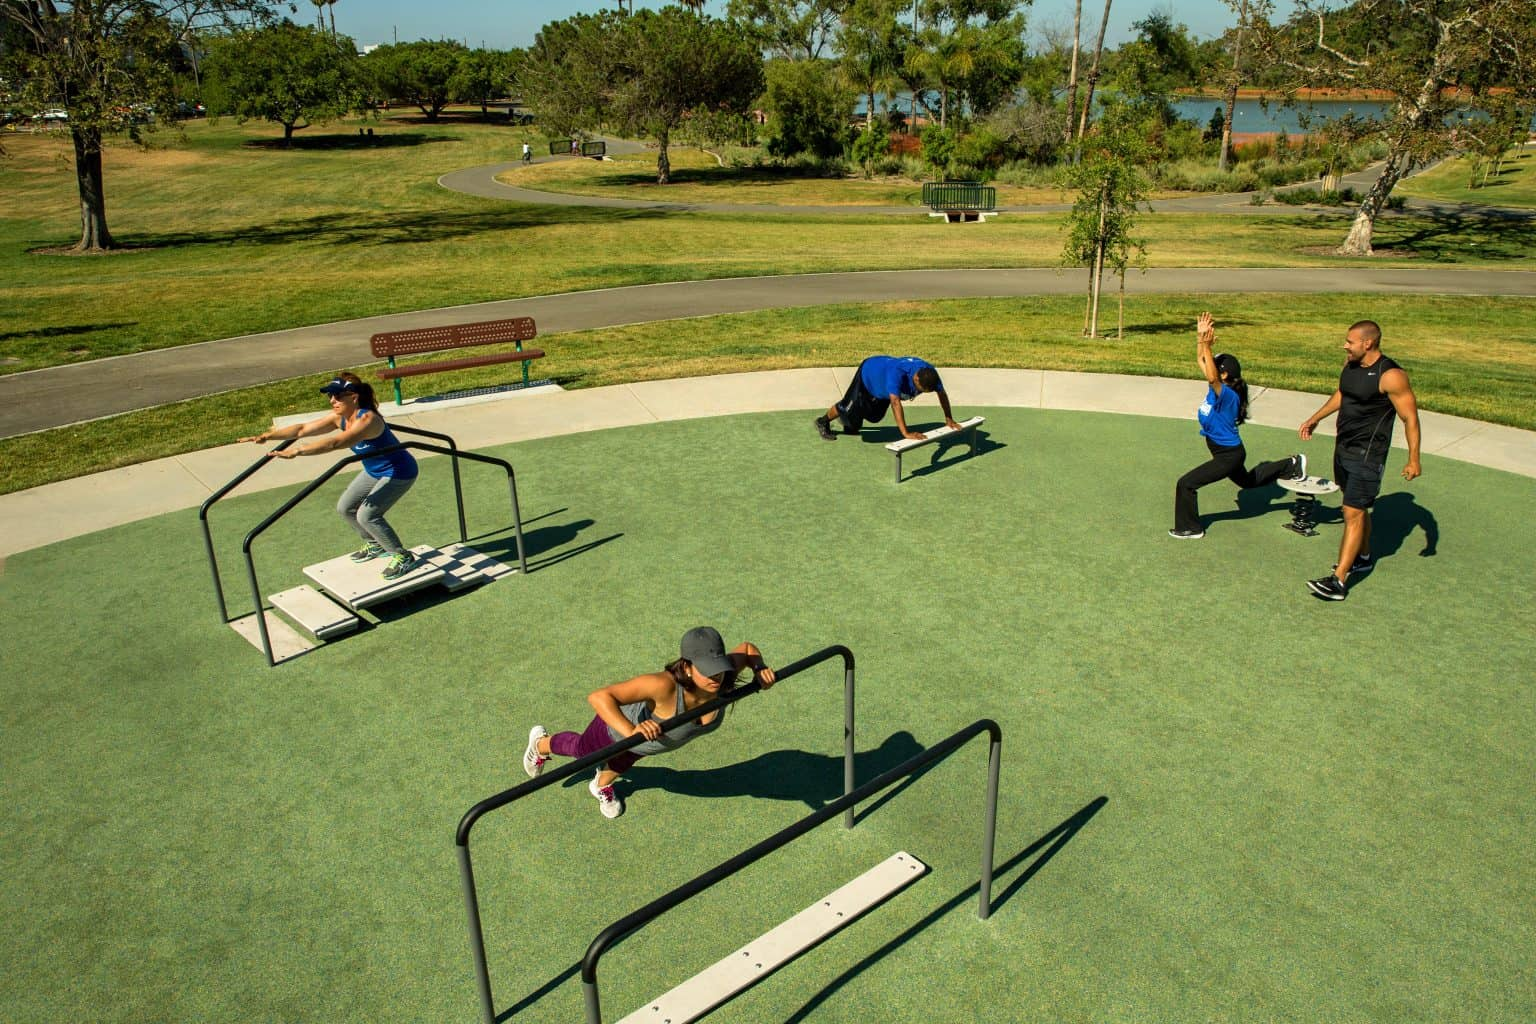 outdoor-fitness-equipment_49643791966_o-1536x1024